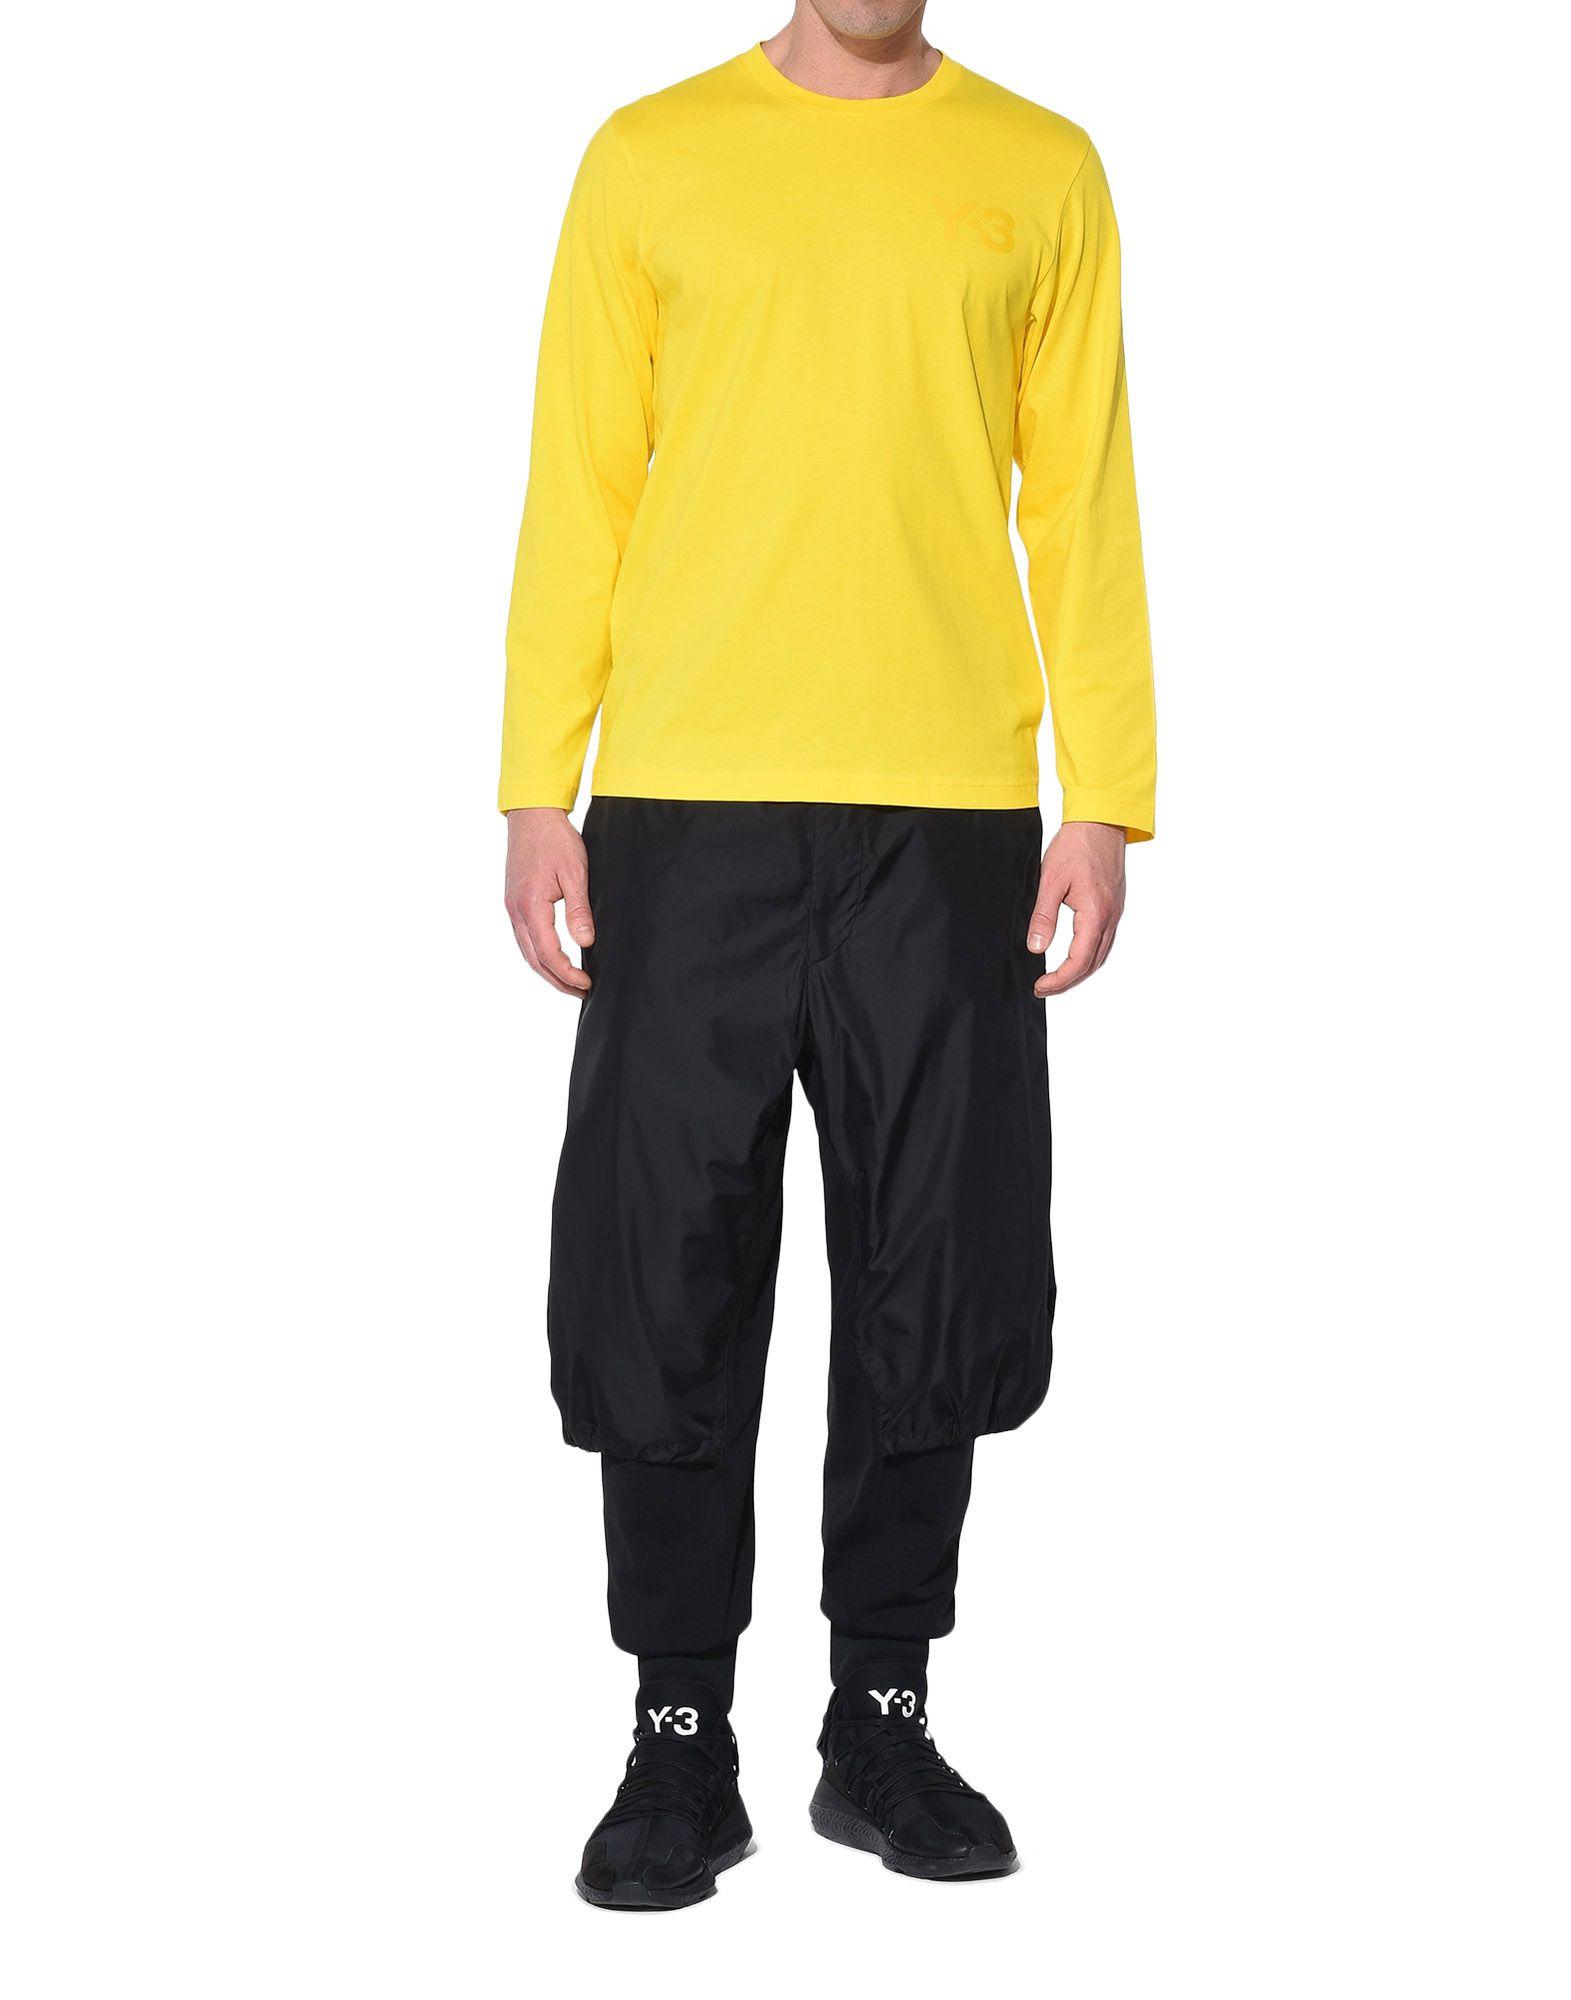 Y-3 Y-3 Classic Tee Long sleeve t-shirt Man a